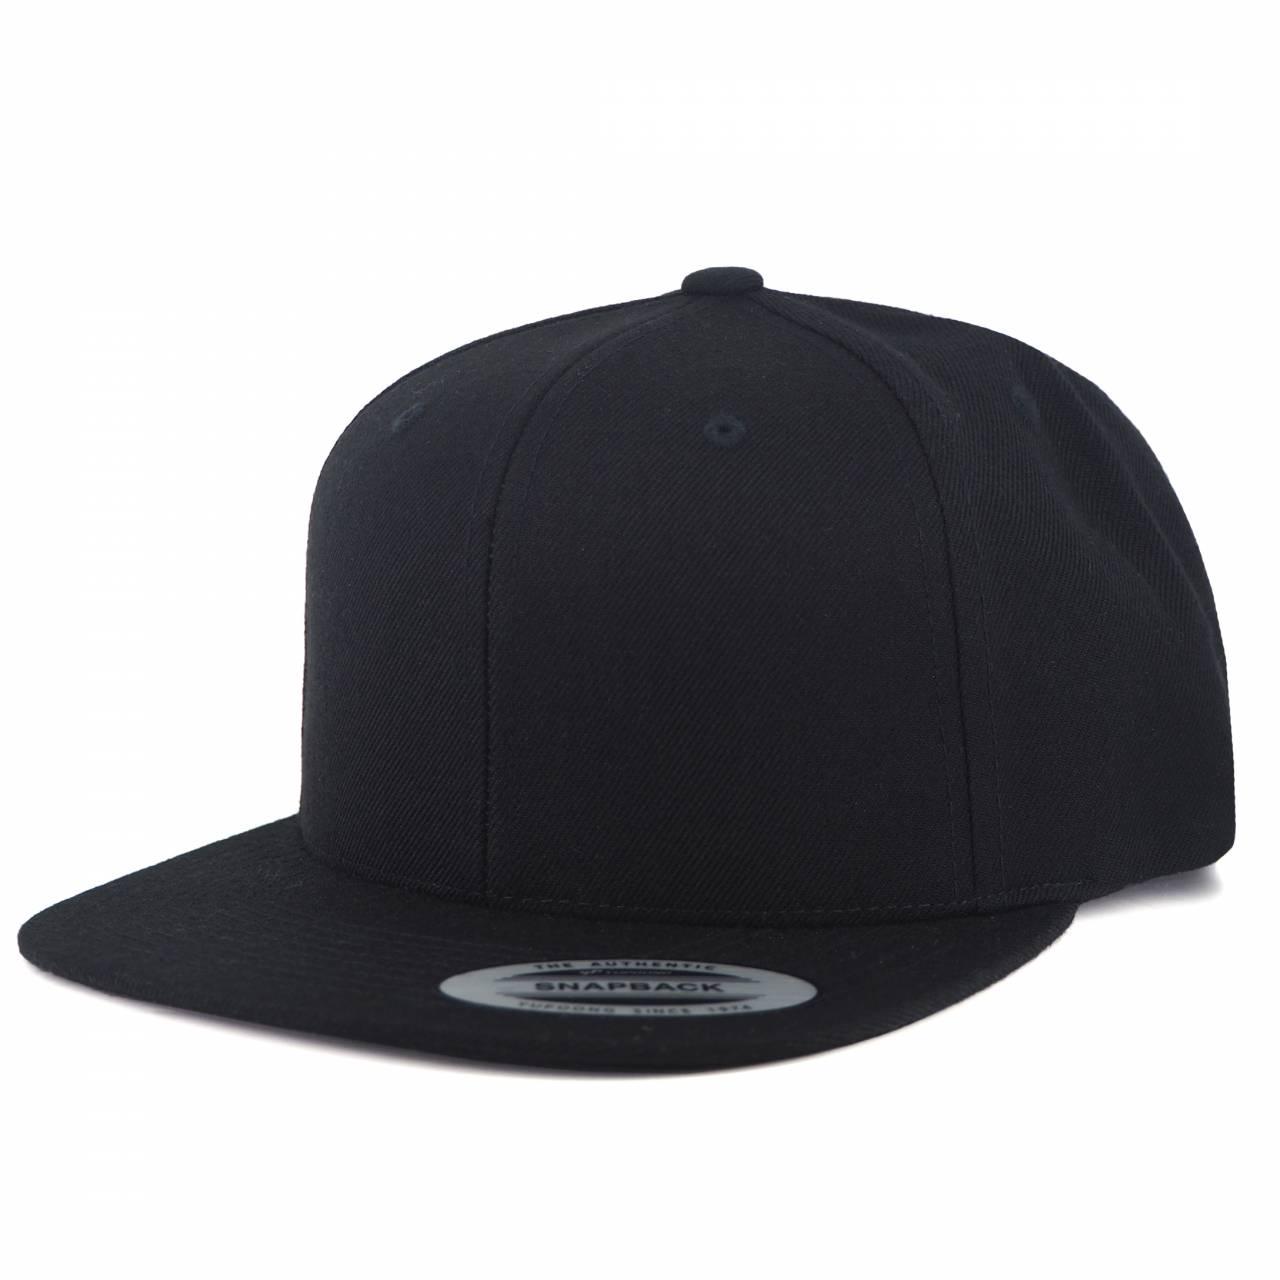 6089M-00017-00 50 CLASSIC SNAPBACK BLACK BLANK CAP